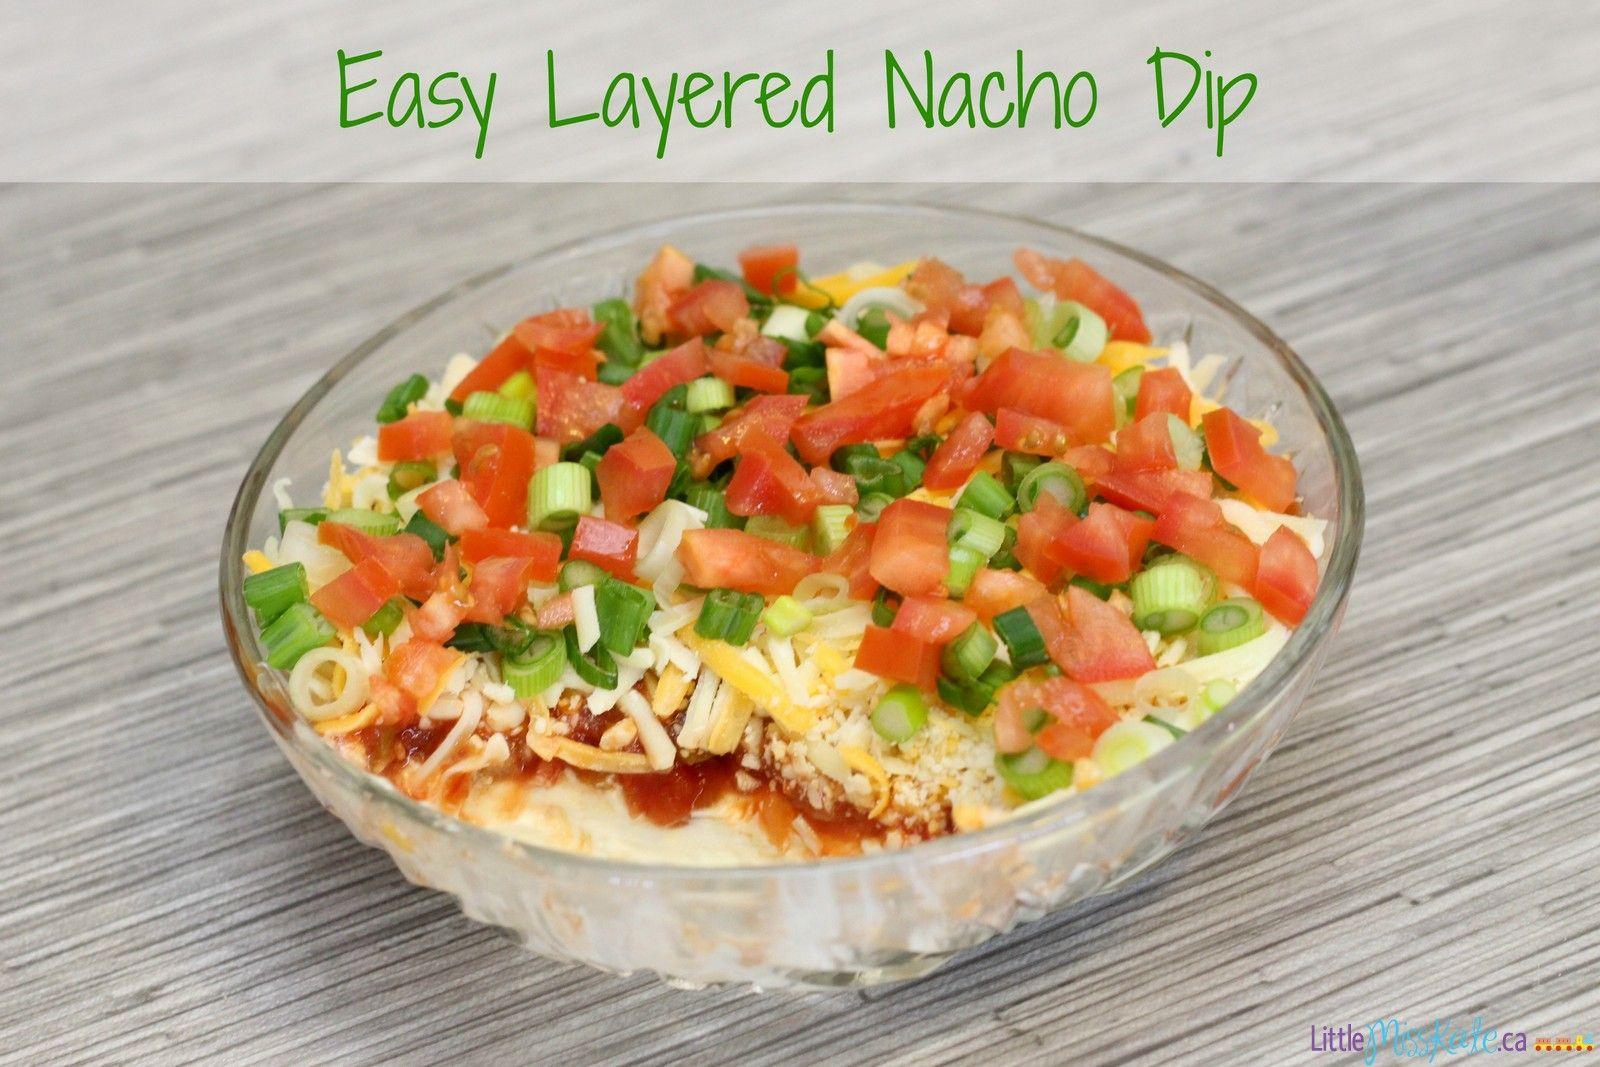 Easy Layered Nacho Dip Recipe Super Bowl Food Ideas Kate Company Recipe Easy Layered Nacho Dip Nacho Dip Layered Nacho Dip